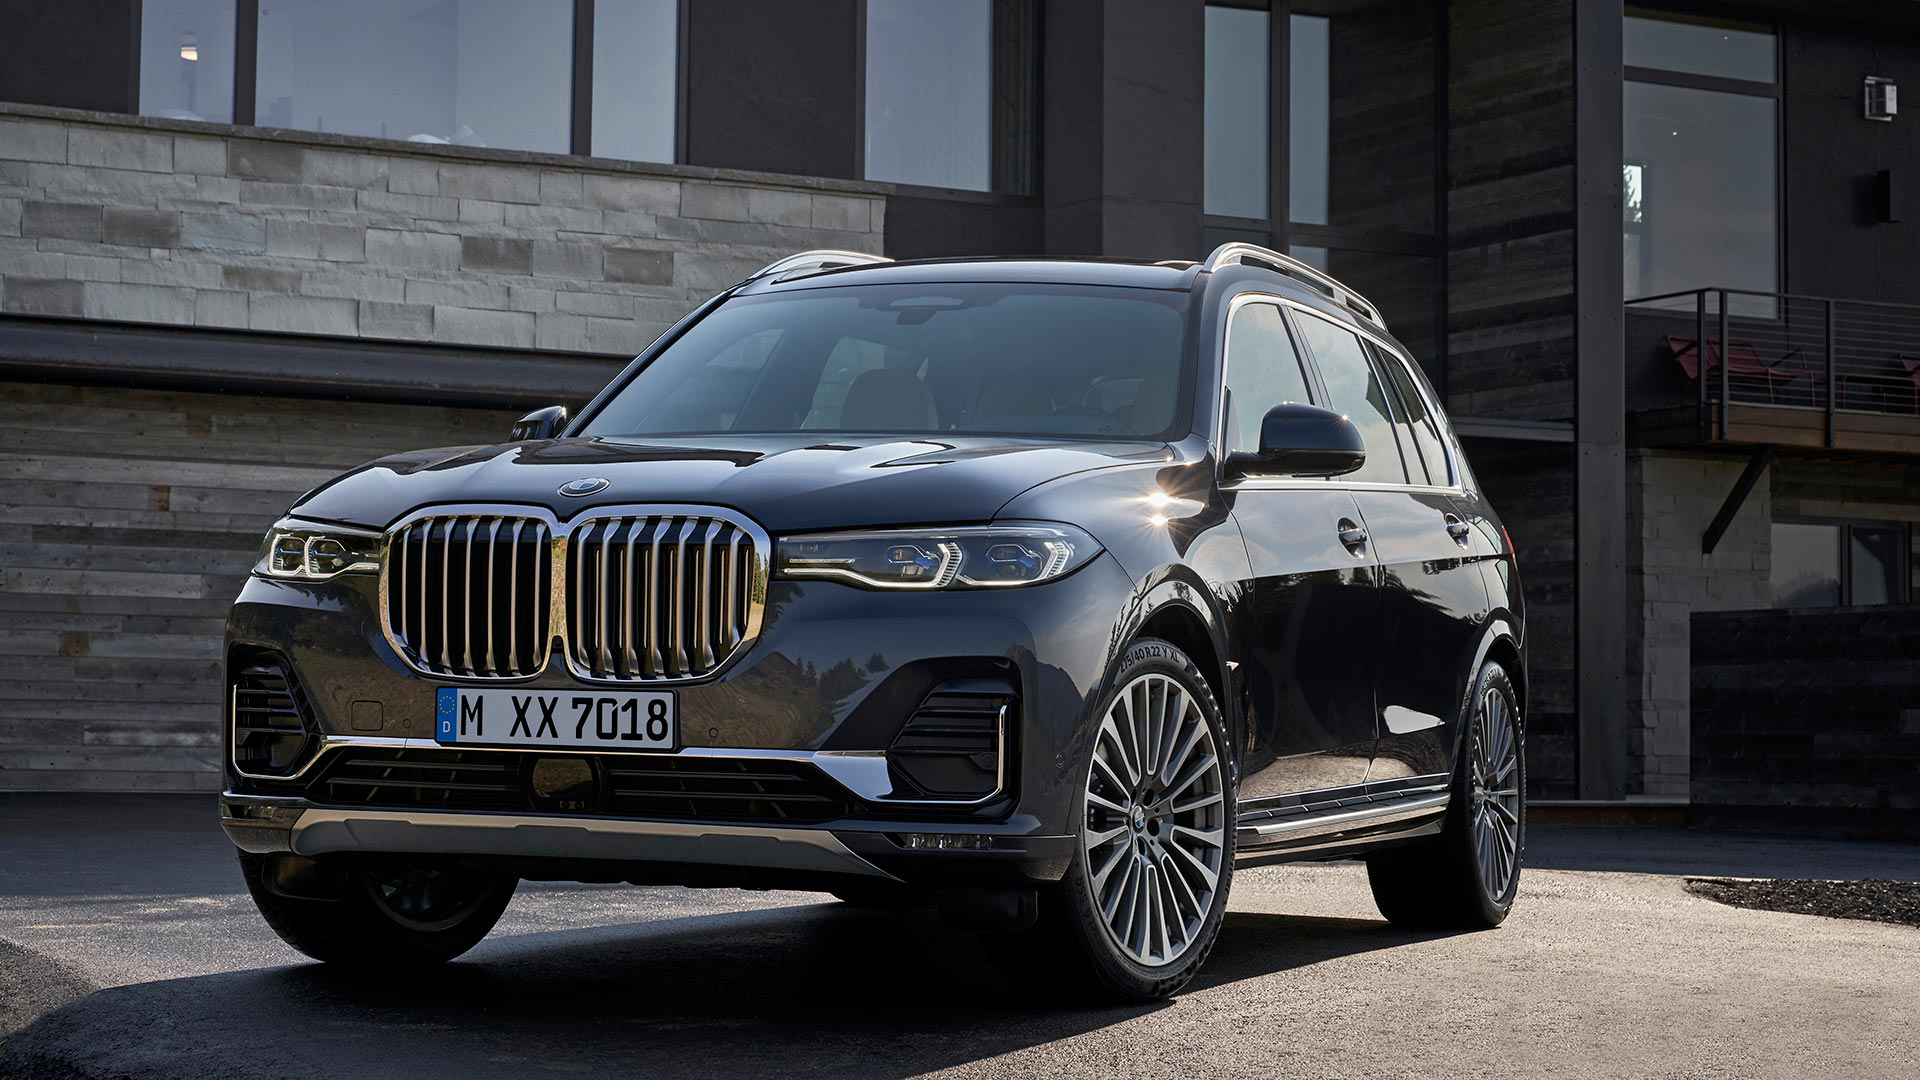 2019 G07 BMW X7